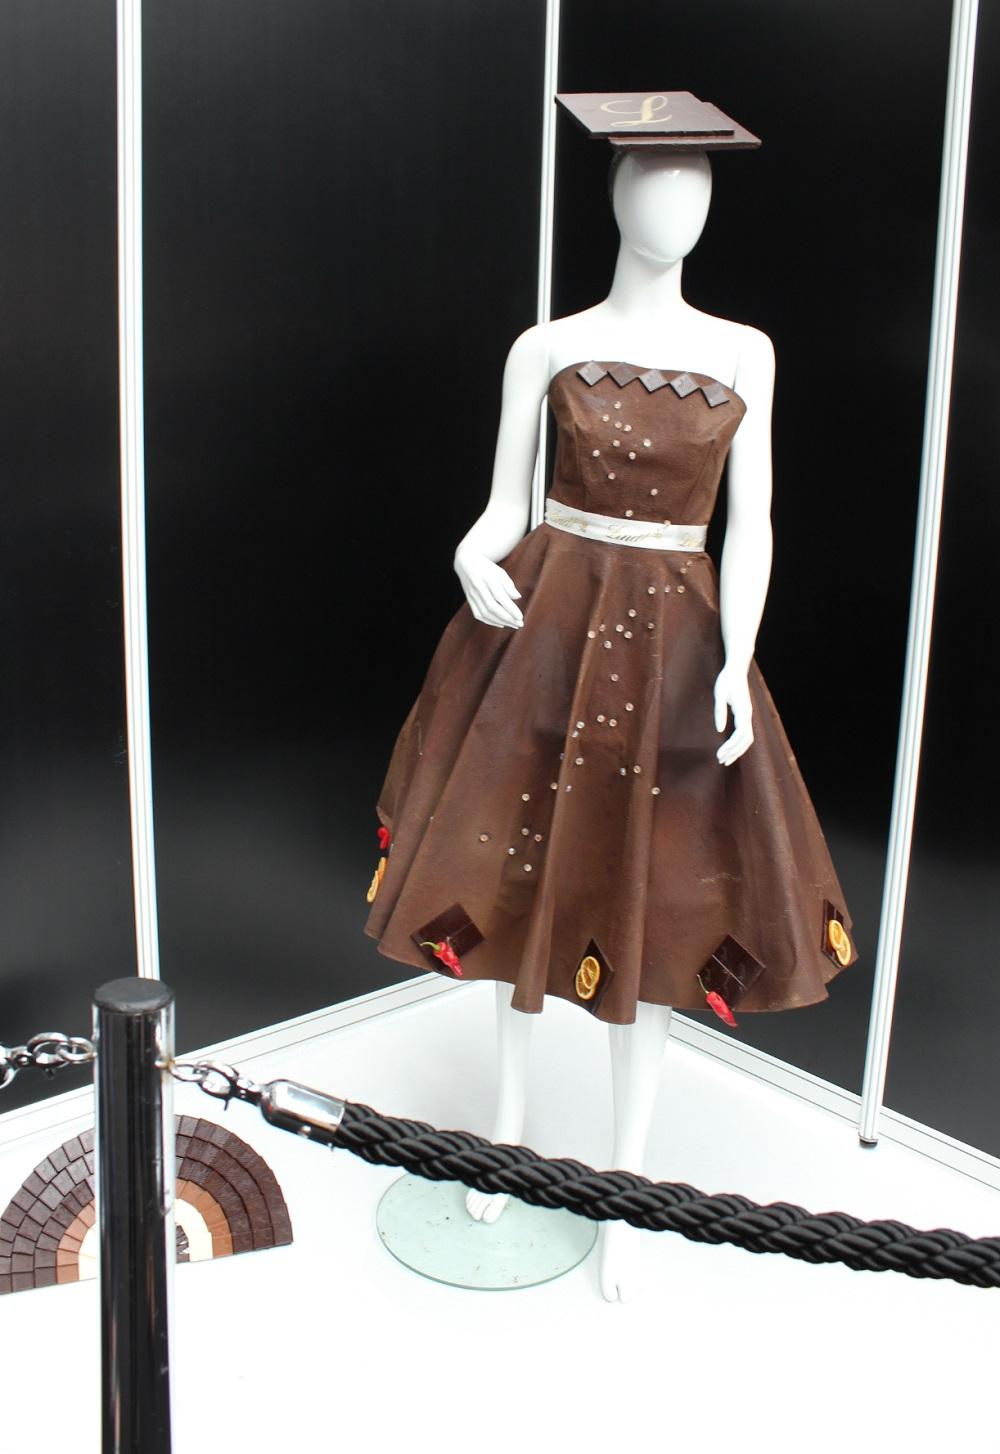 Salon Du Chocolat Show 2013 31